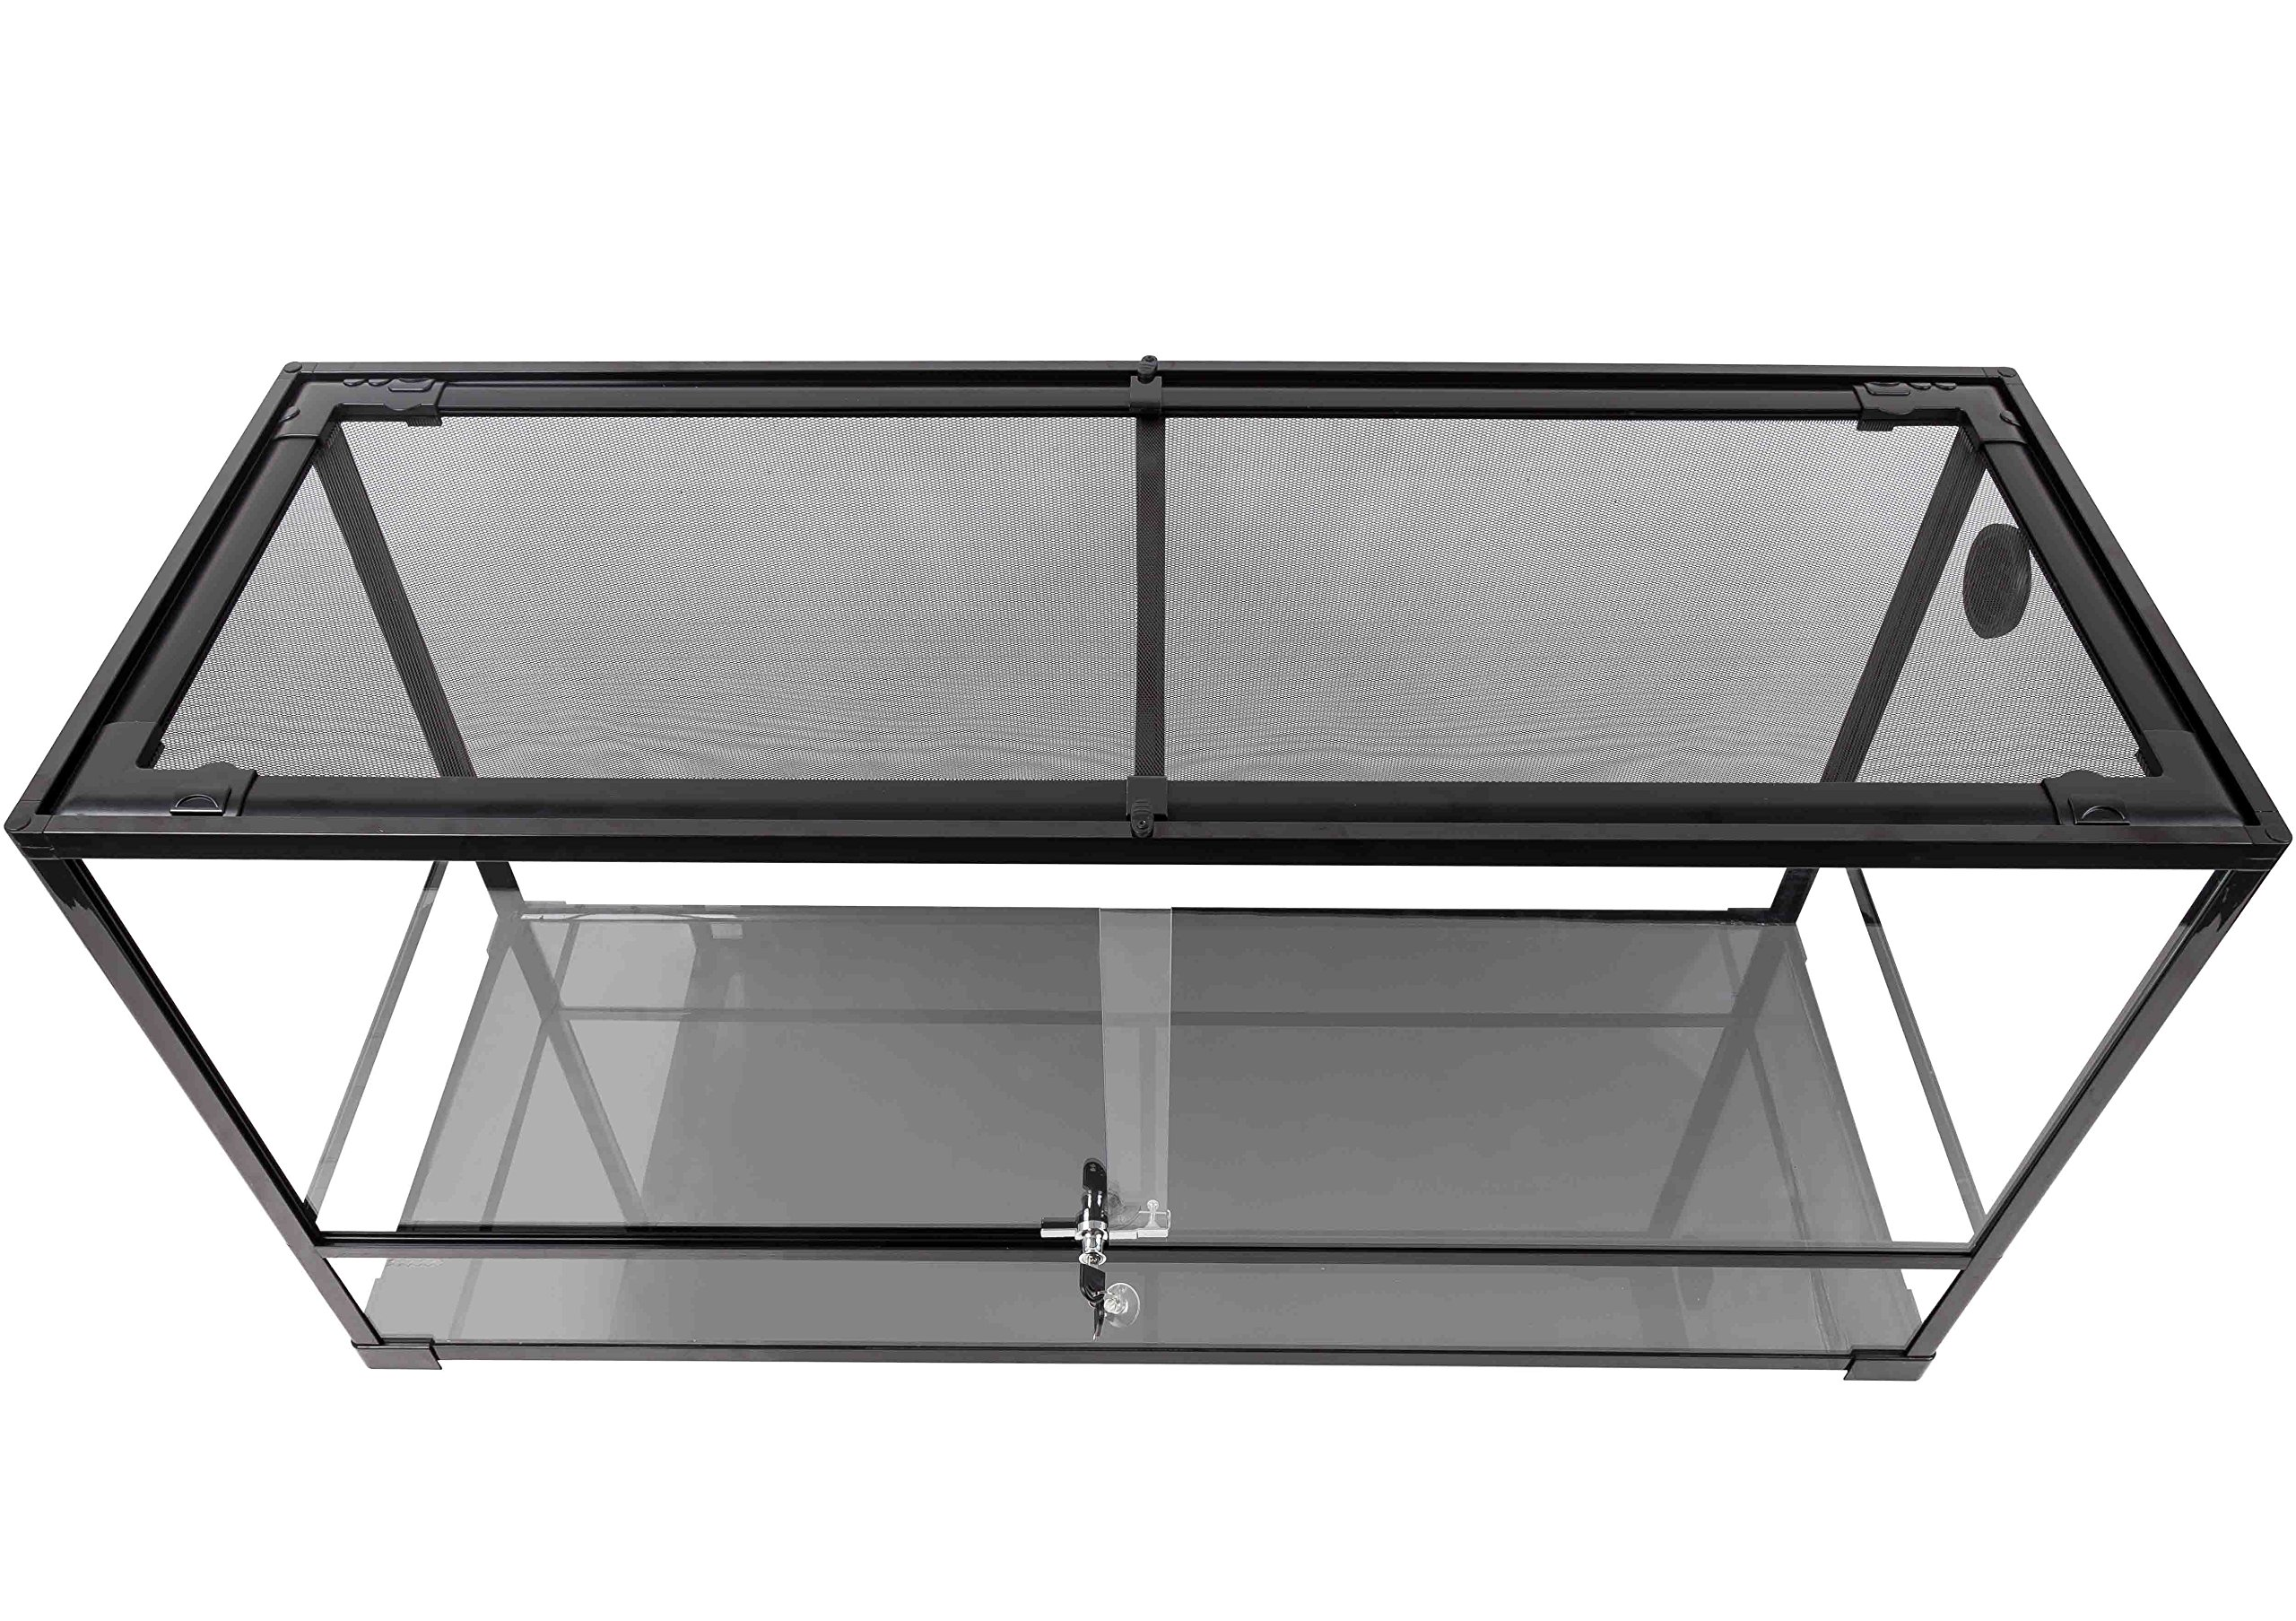 Oiibo Knock Down Glass Terrarium (Extra Large, Tall 47'' x 18'' x 24'') by Oiibo (Image #5)